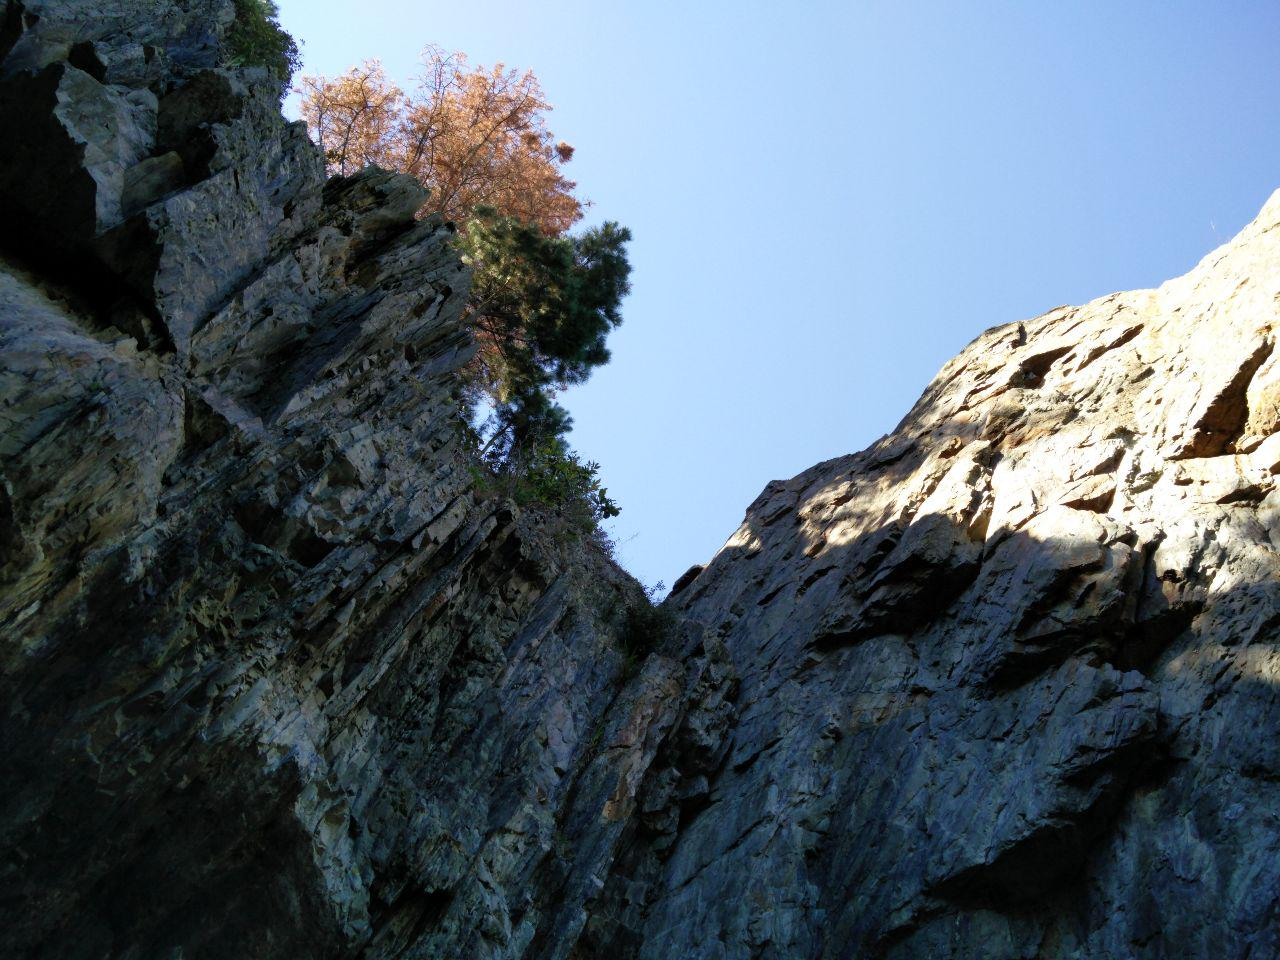 Cliffs at Monkey Bay in New Zealand